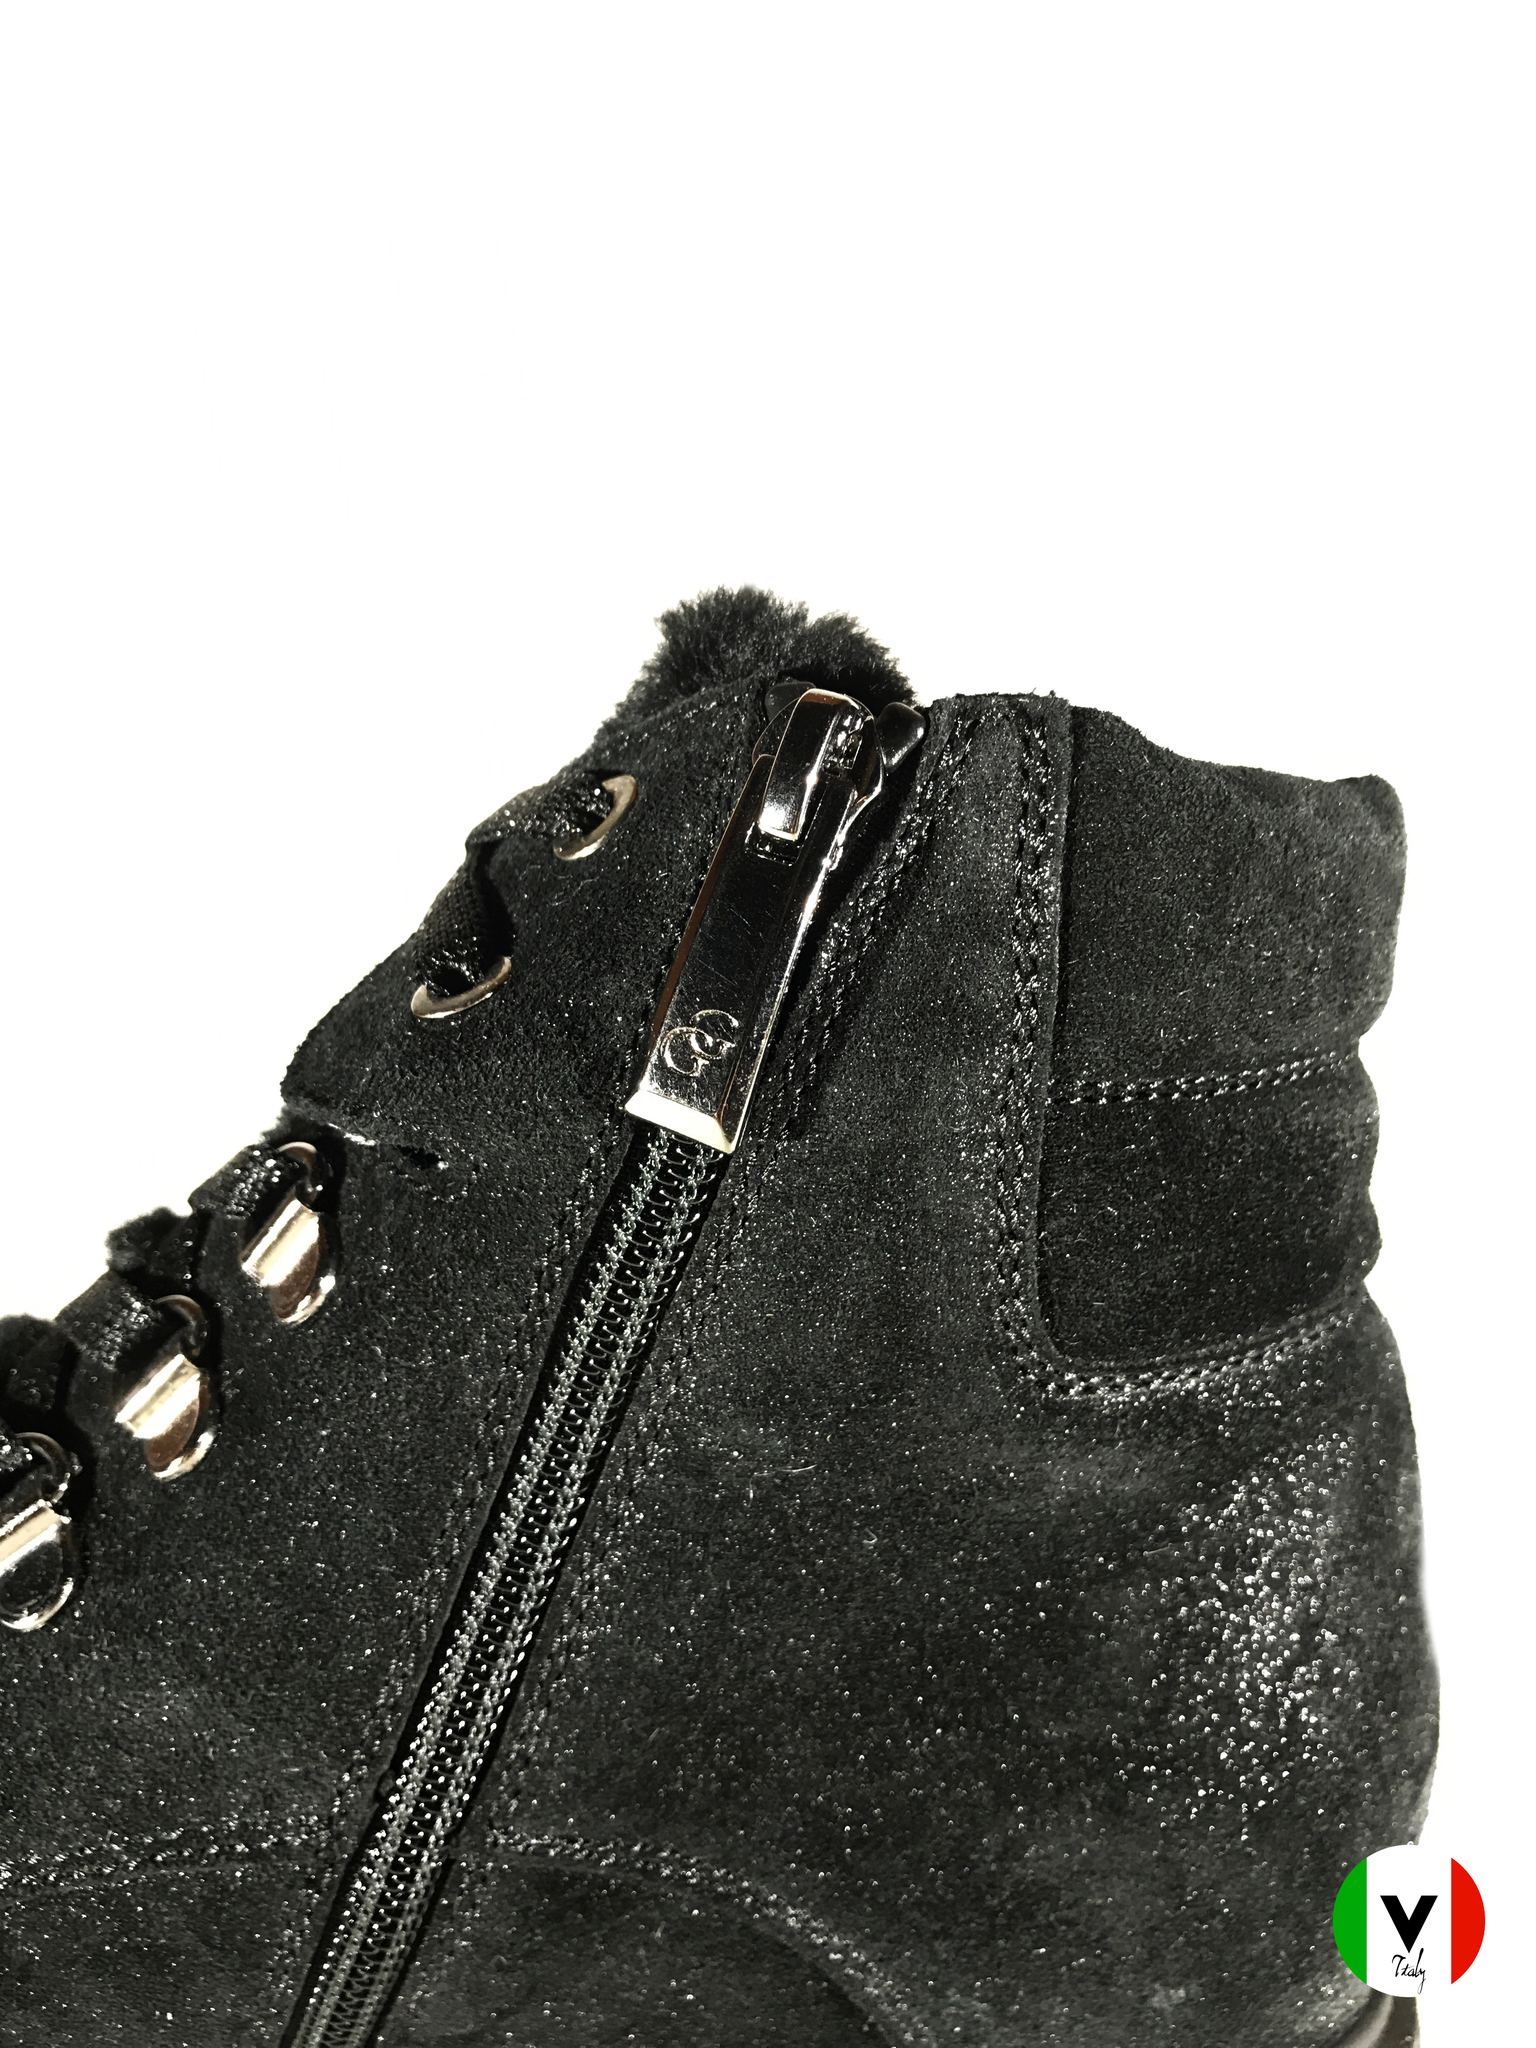 Зимние ботинки Giada Gabrielli из замши с лазерной обработкой 840, артикул 840, сезон зима, цвет чёрный, материал замша, цена 11 000 руб., veroitaly.ru